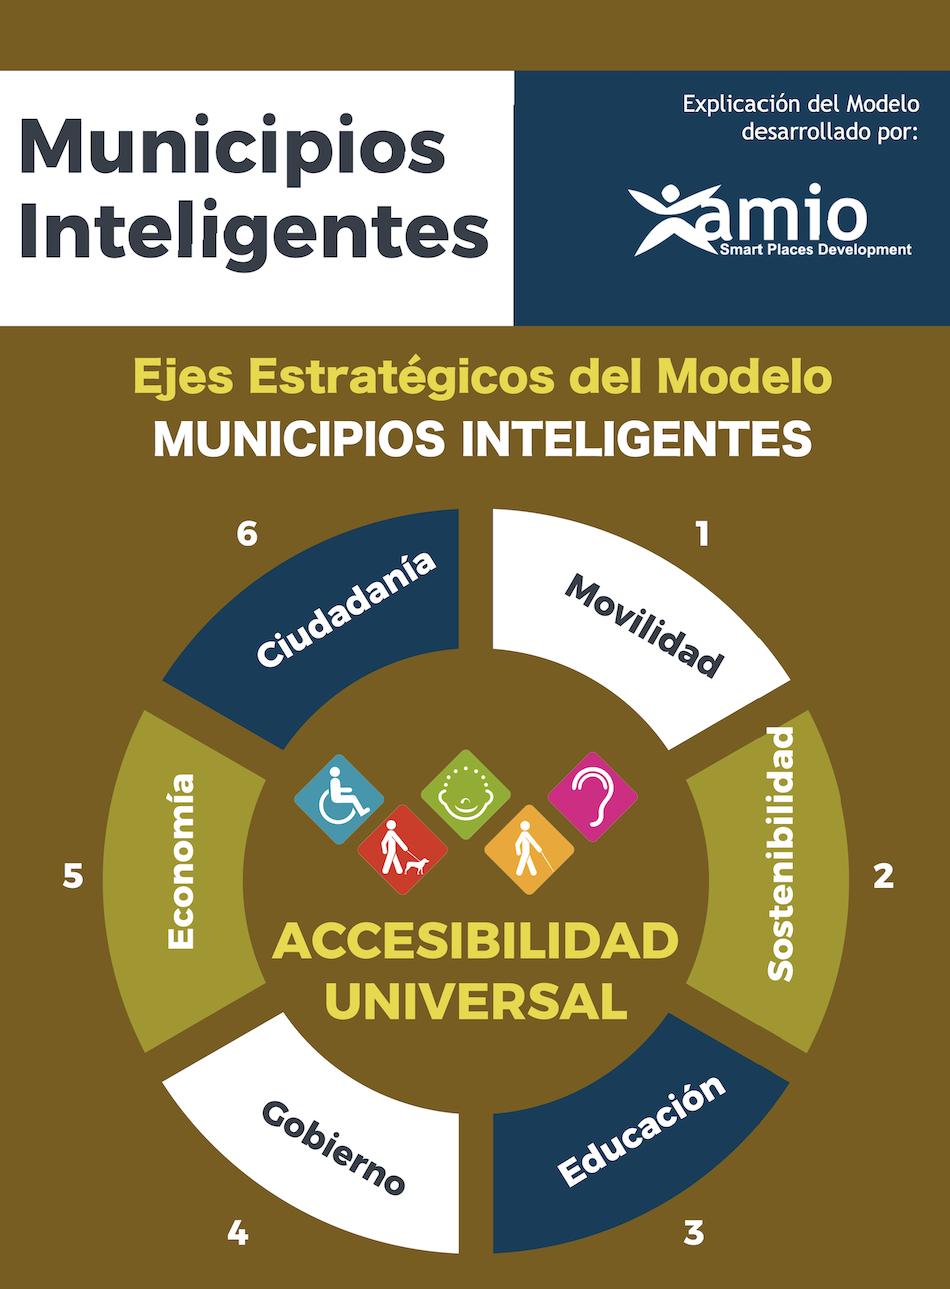 Infografía MUNICIPIOS INTELIGENTES, Amio Ingenieros, Santander, cantabria, dti, destino turistico inteligente, 1